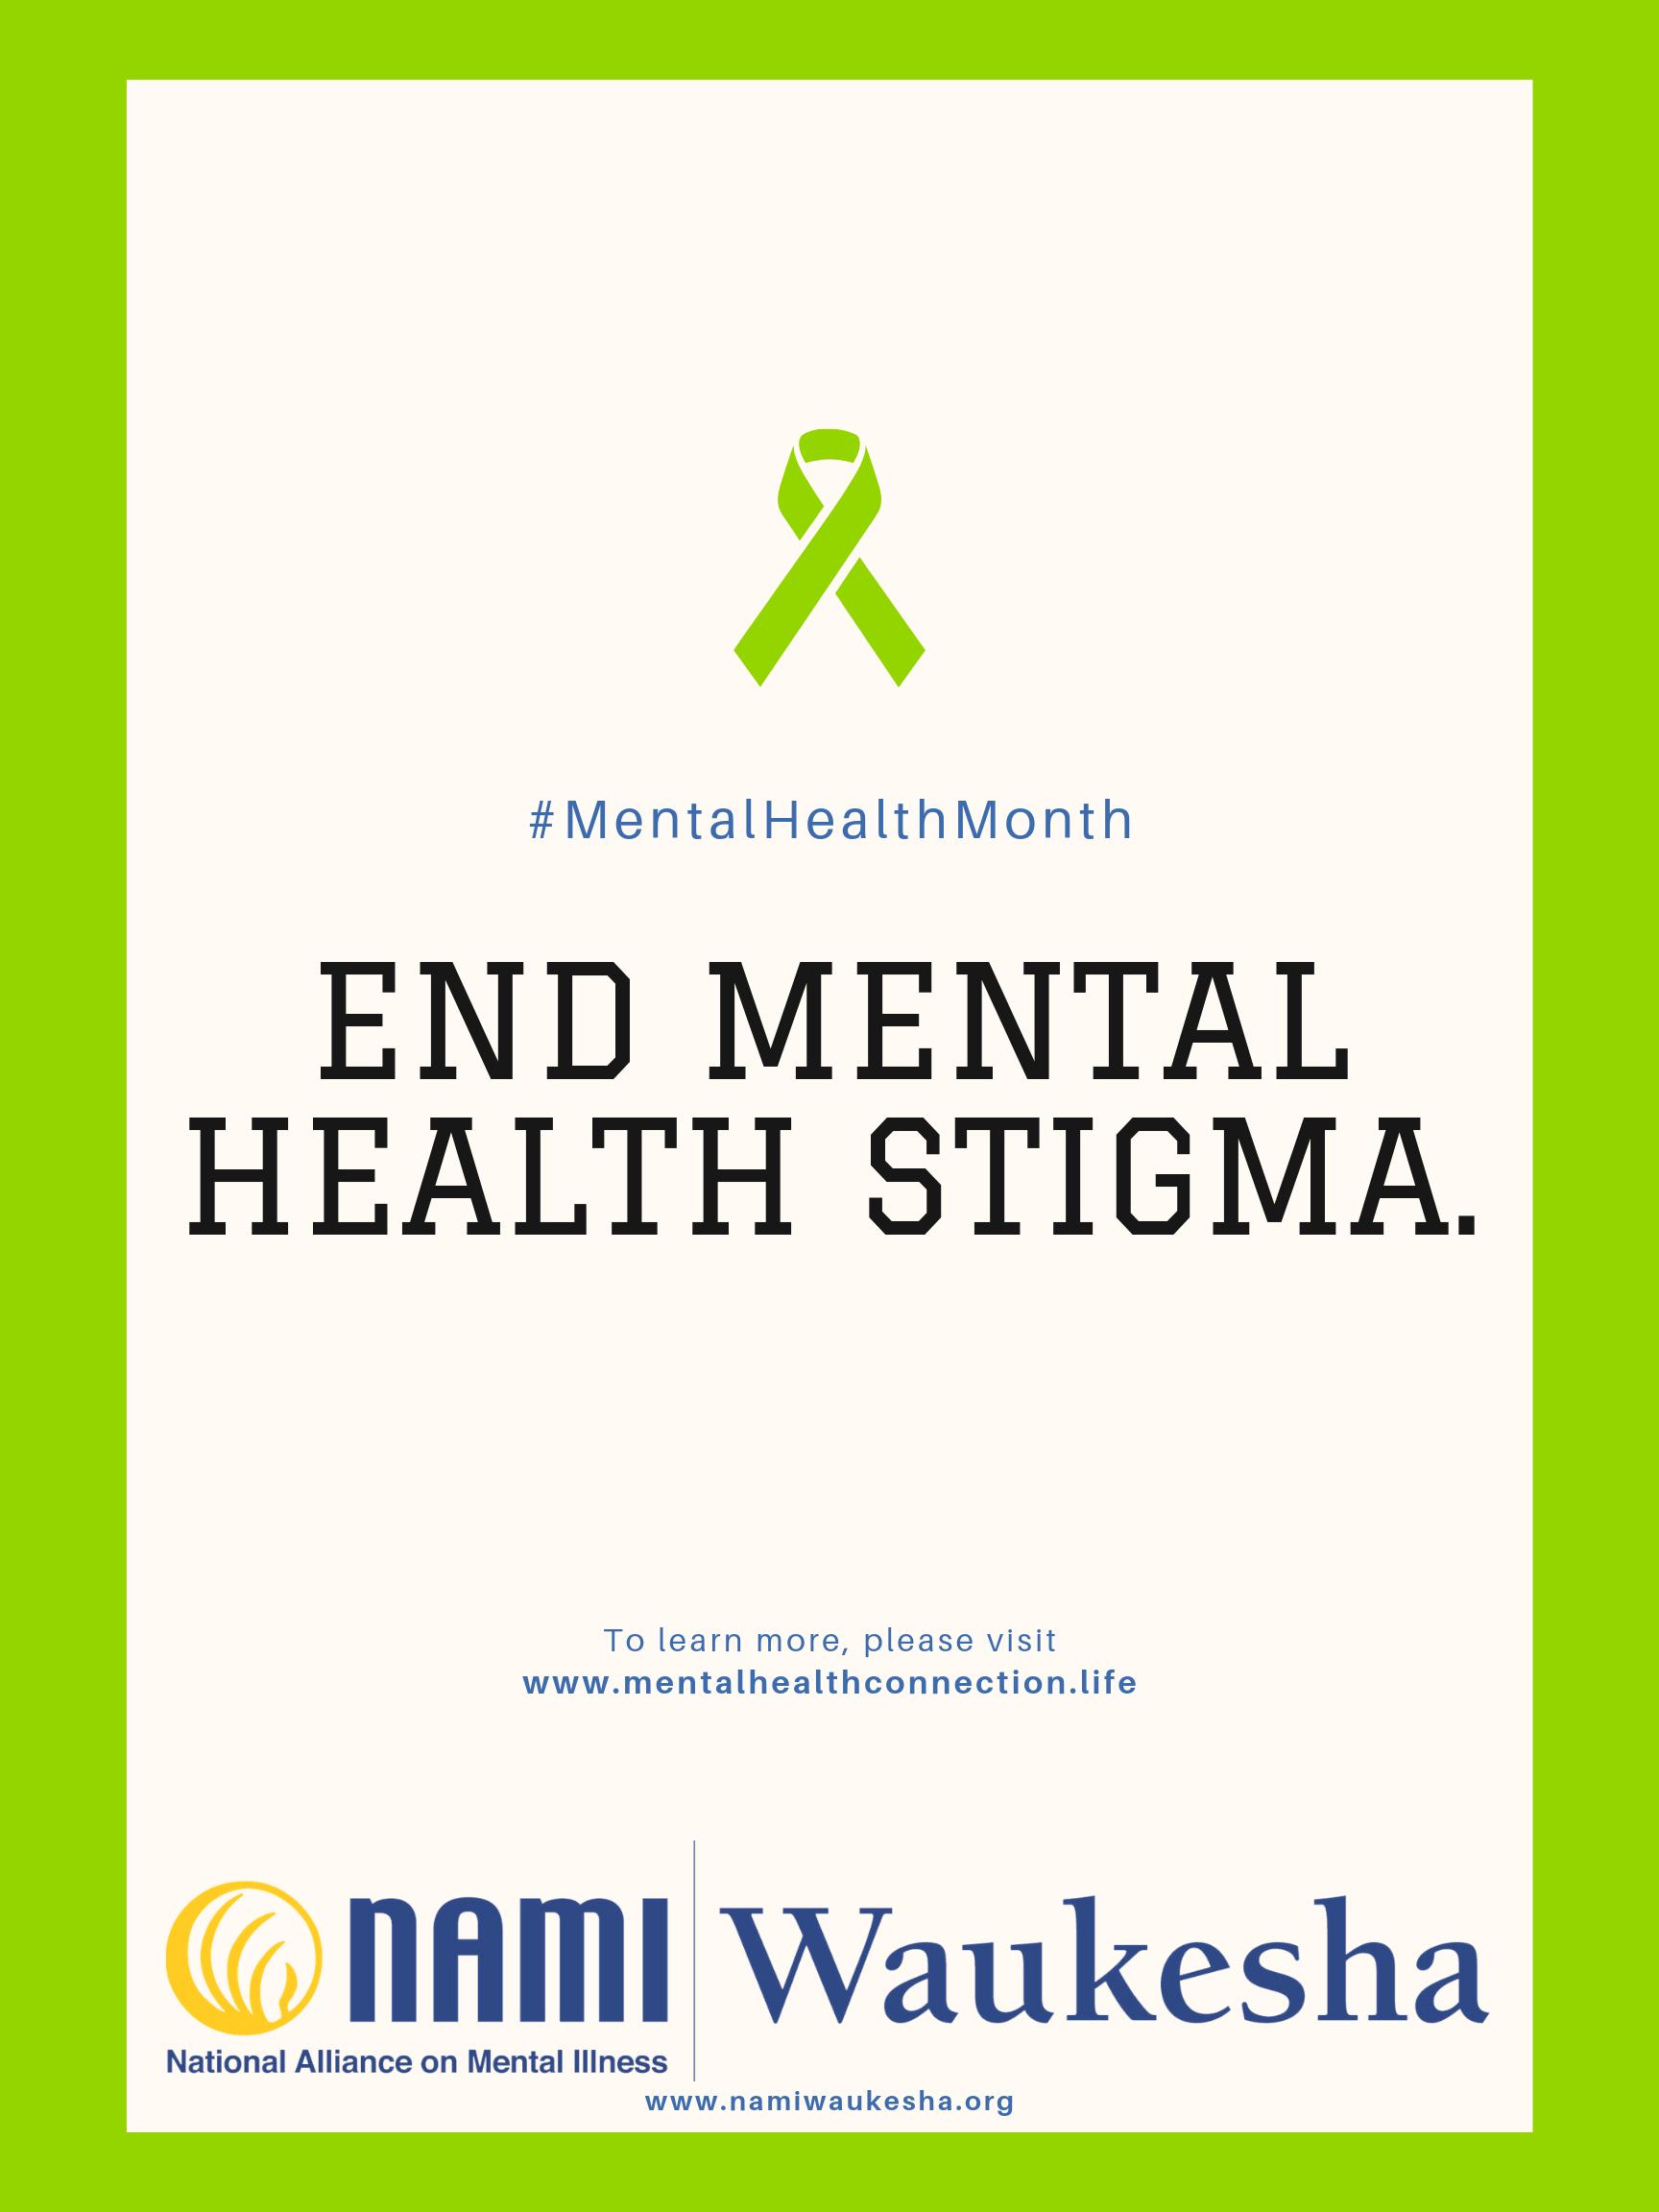 MHM_Green Rib - End stigma poster.png